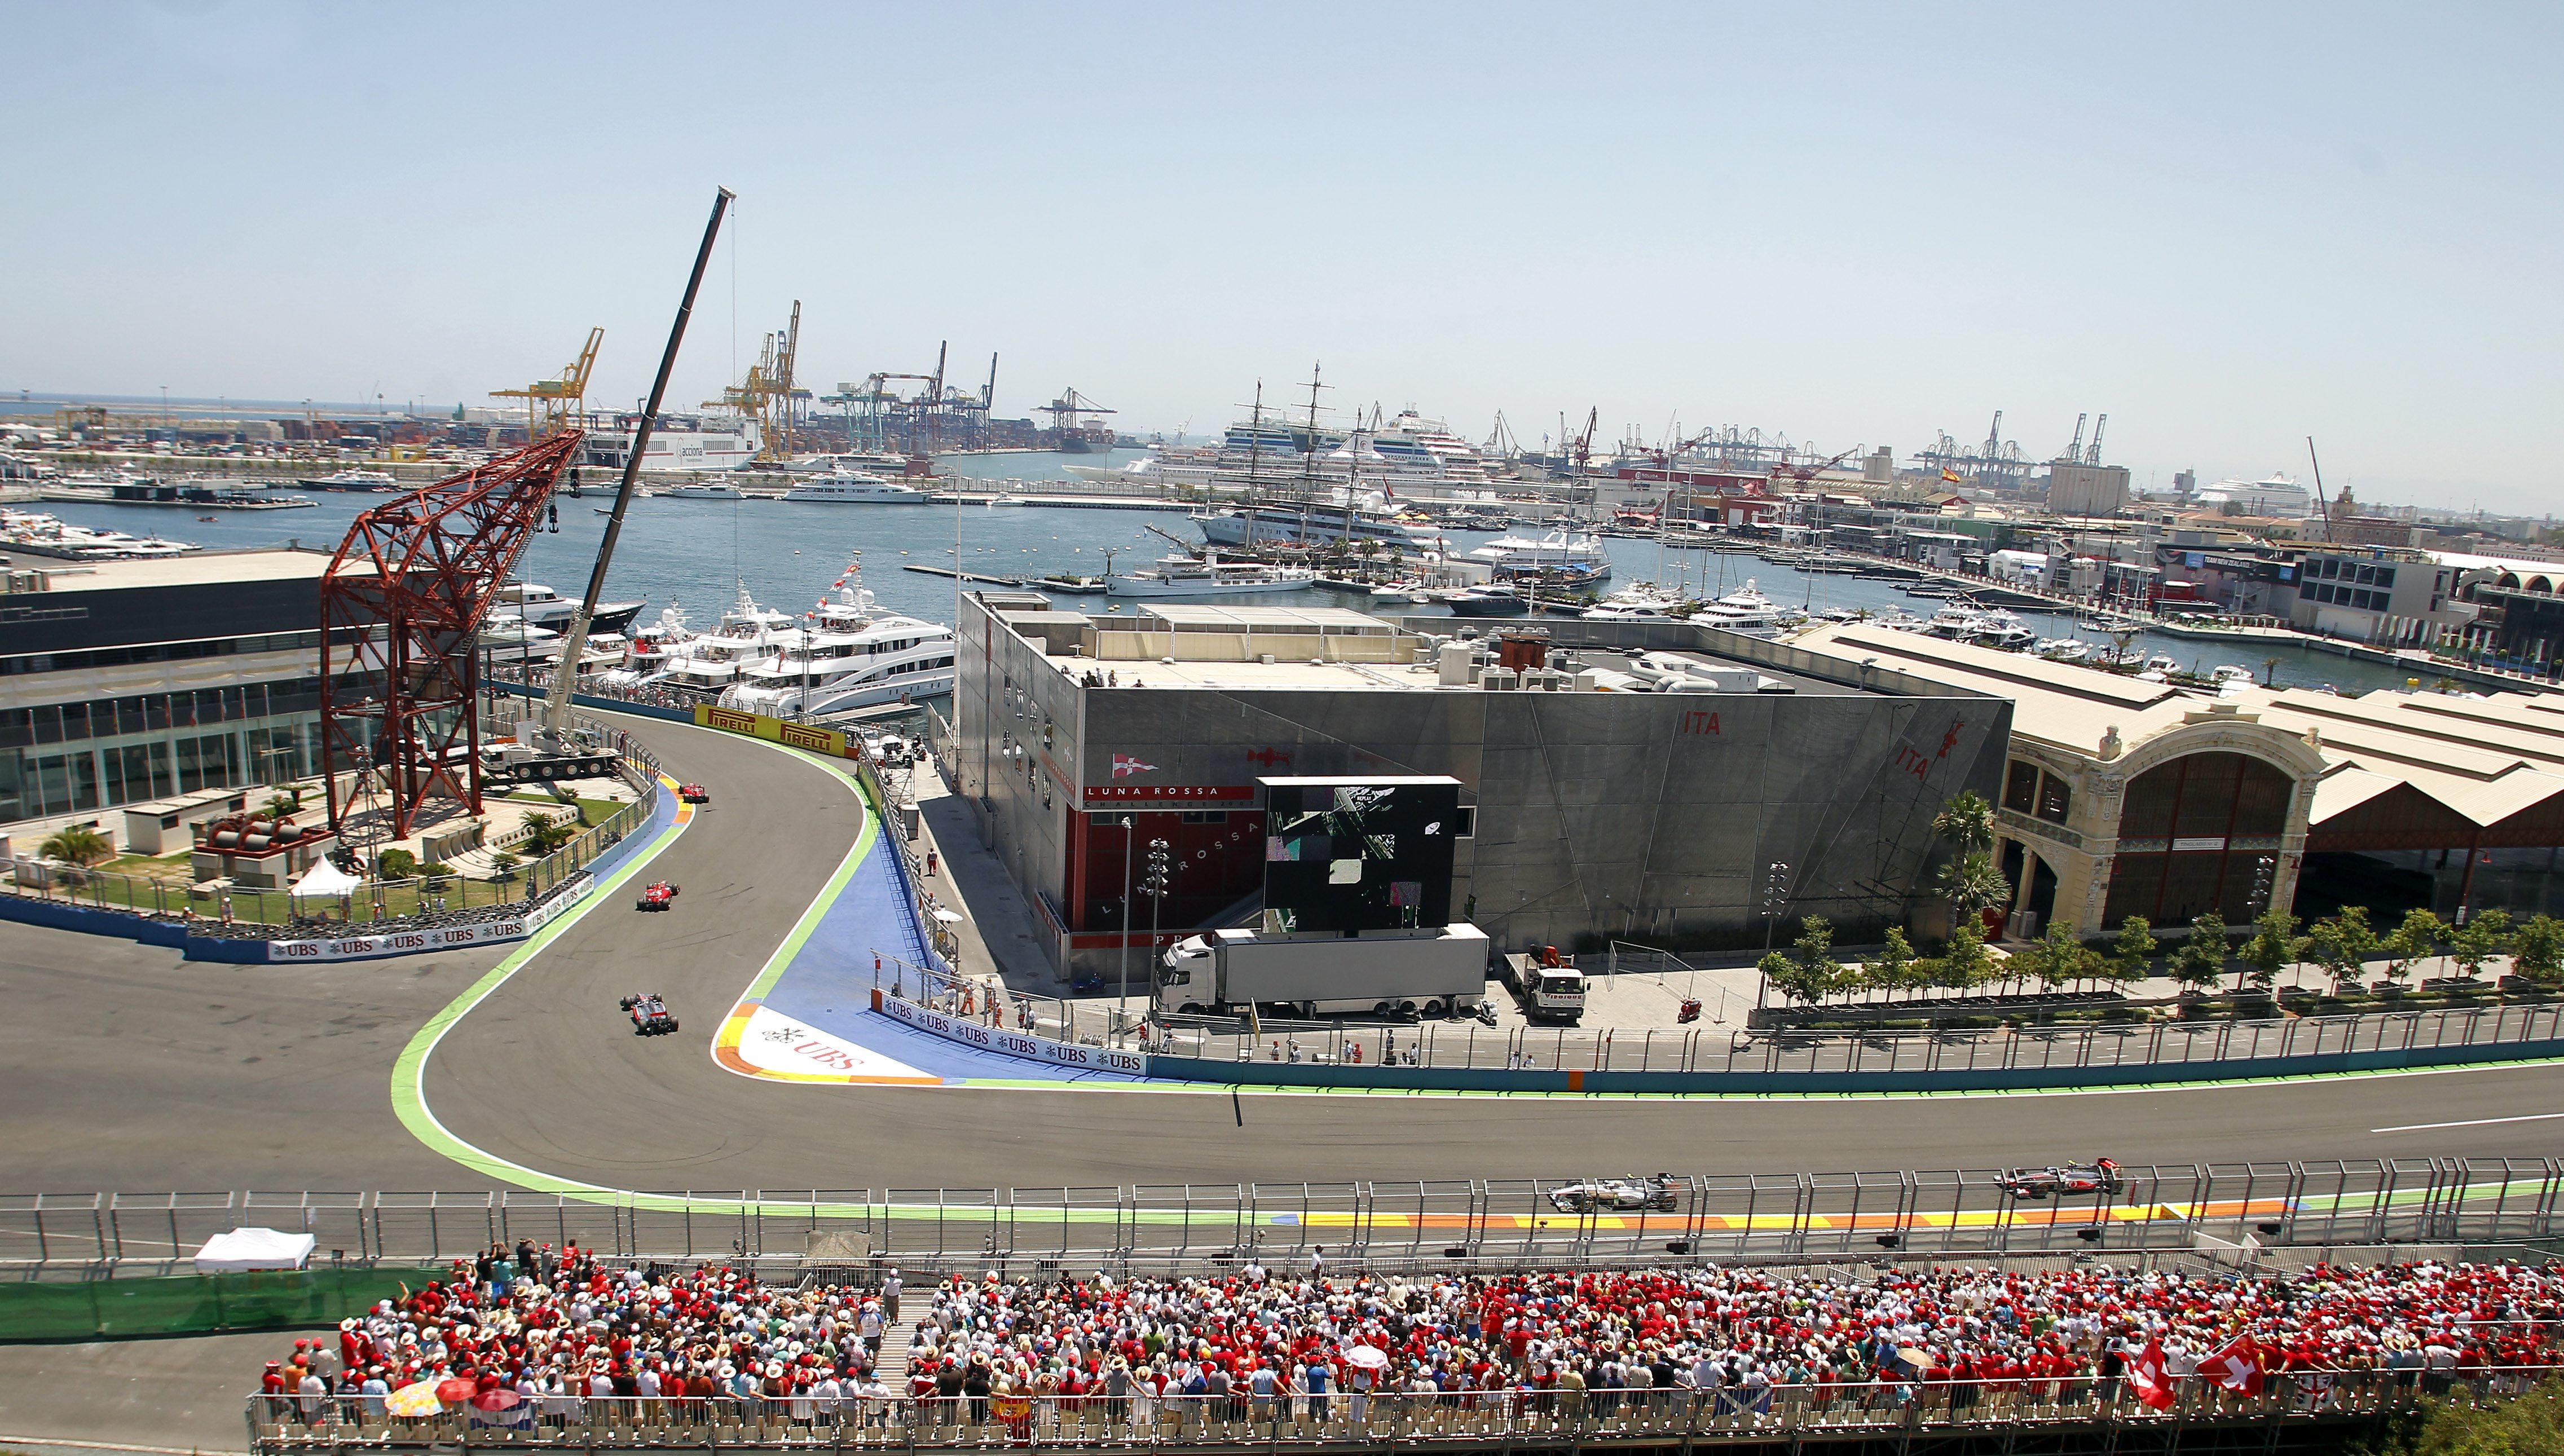 Circuito Valencia F1 : La generalitat sigue a la espera de que se concrete el circuito